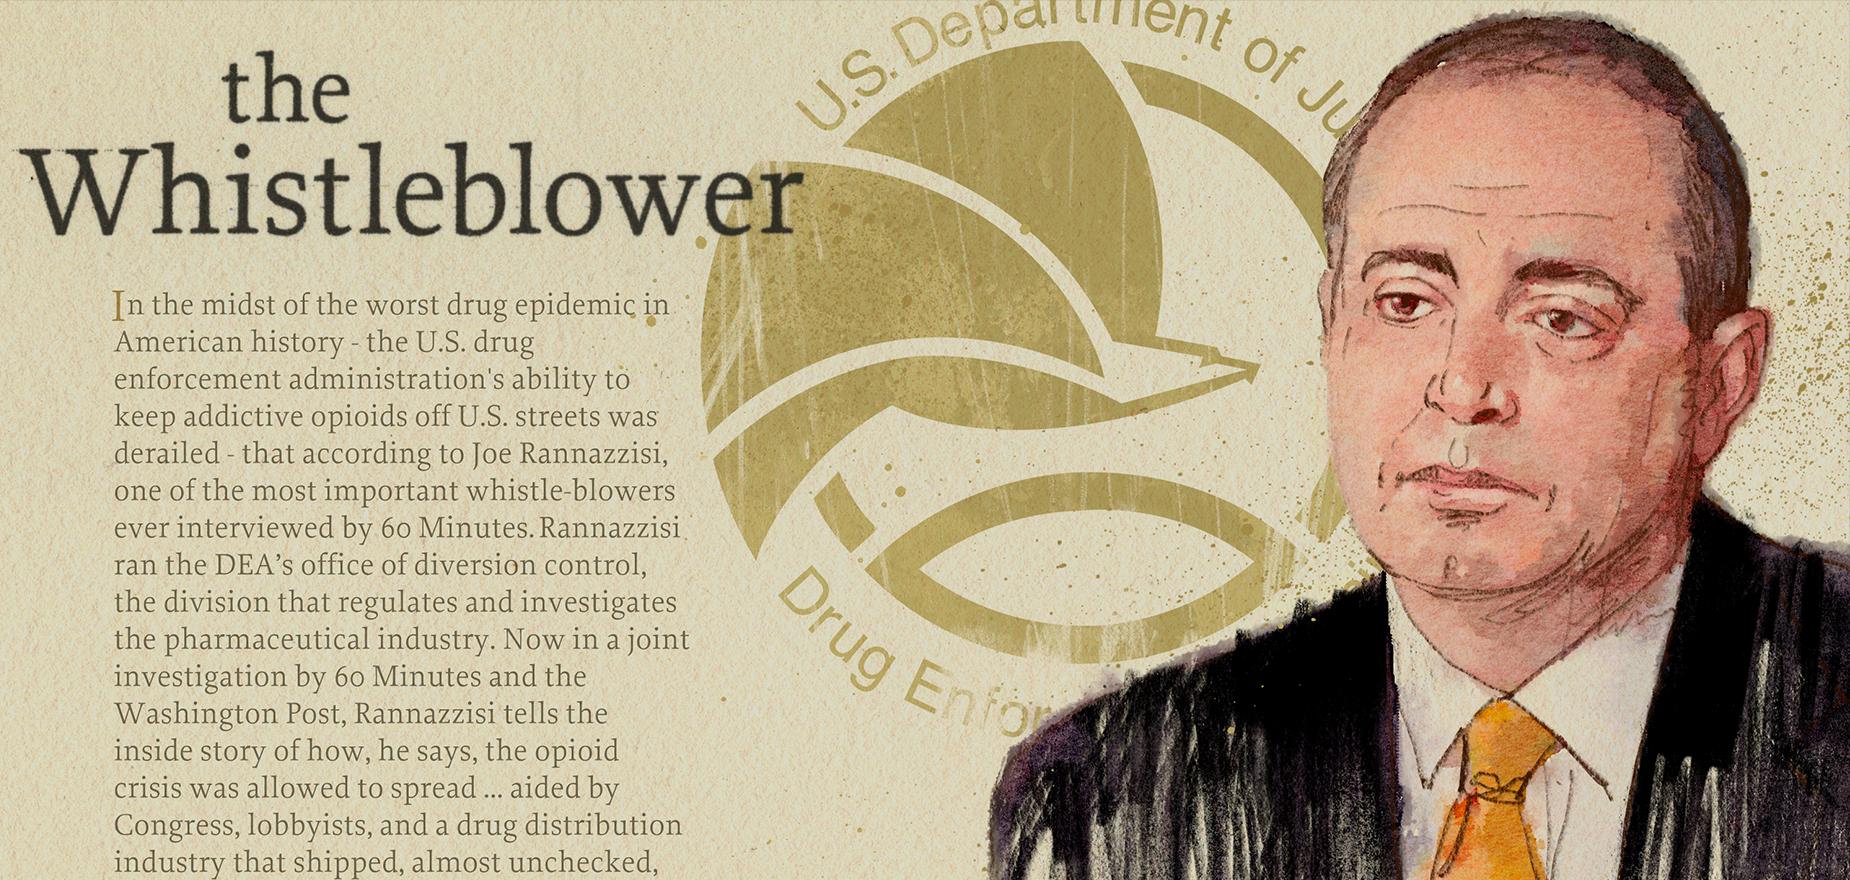 The Whistleblower - CBS News 60 Minutes / The Washington Post